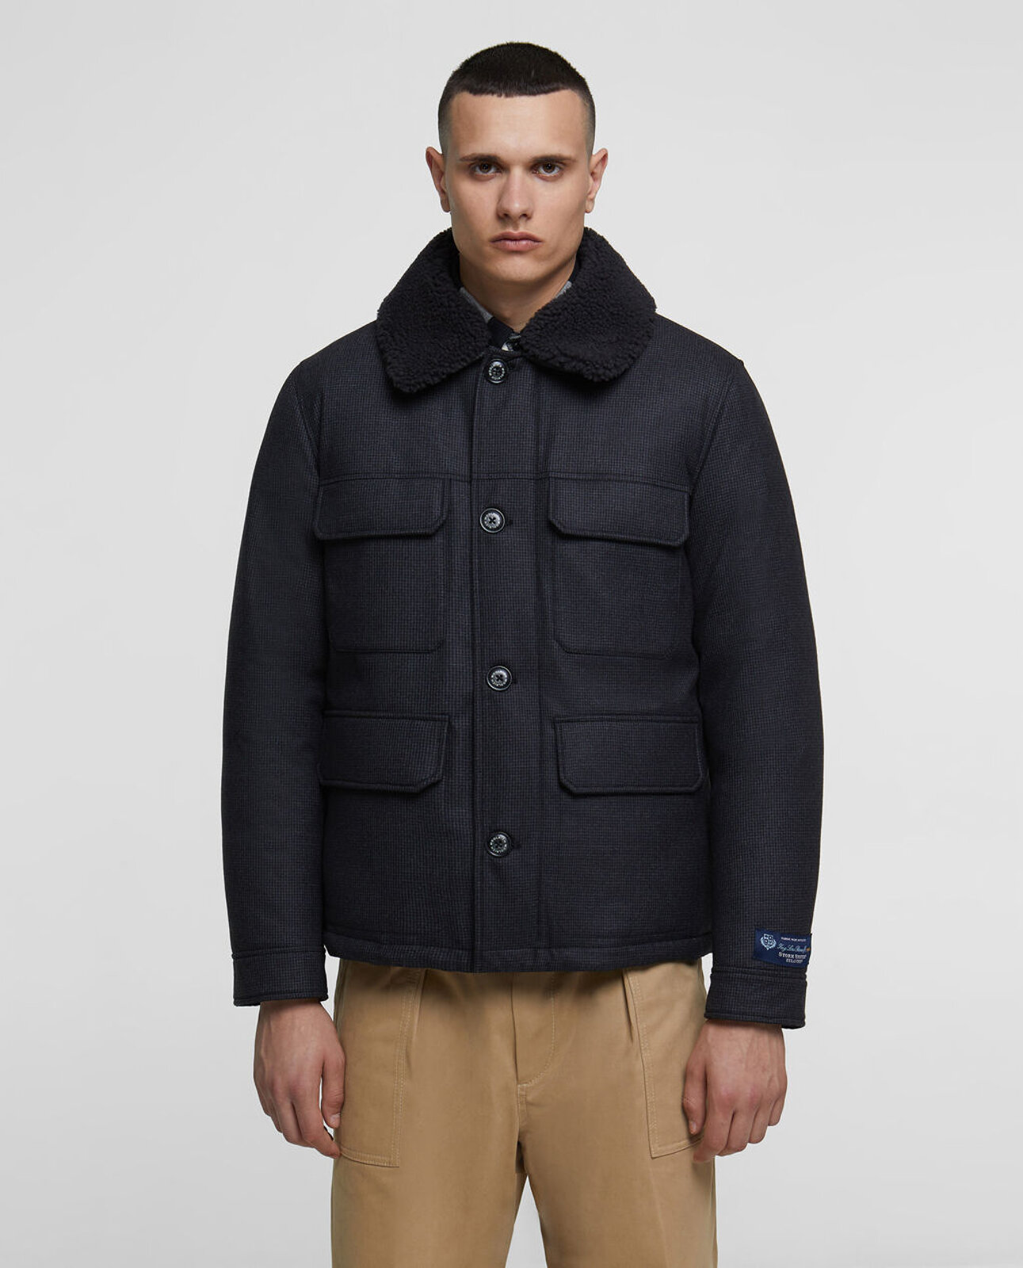 Luxury Stag Jacket - Woolrich